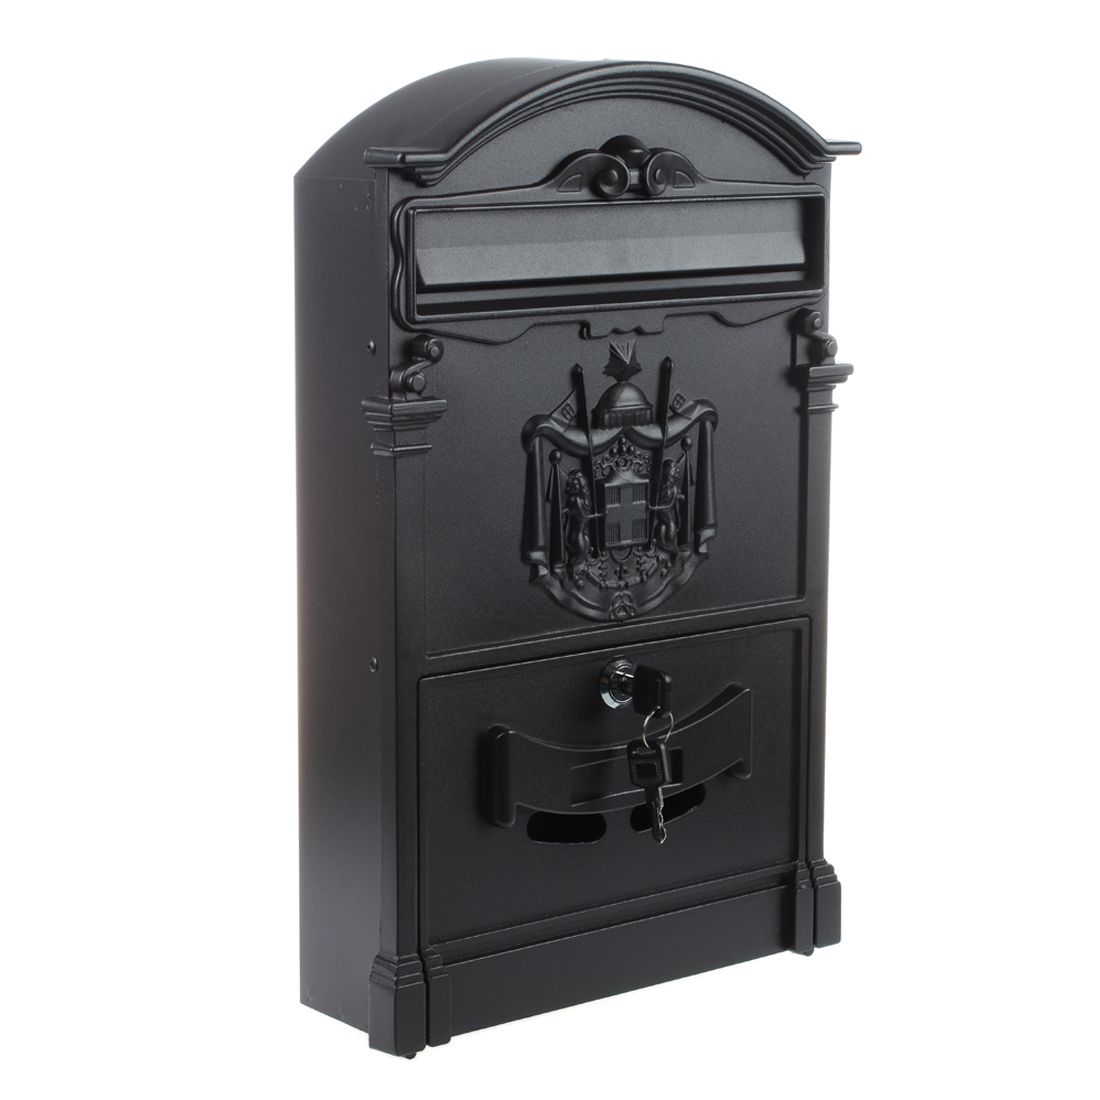 Promotion! Heavy Duty Black Aluminium Lockable Secure Mail Letter Post Box Letterbox NewPromotion! Heavy Duty Black Aluminium Lockable Secure Mail Letter Post Box Letterbox New